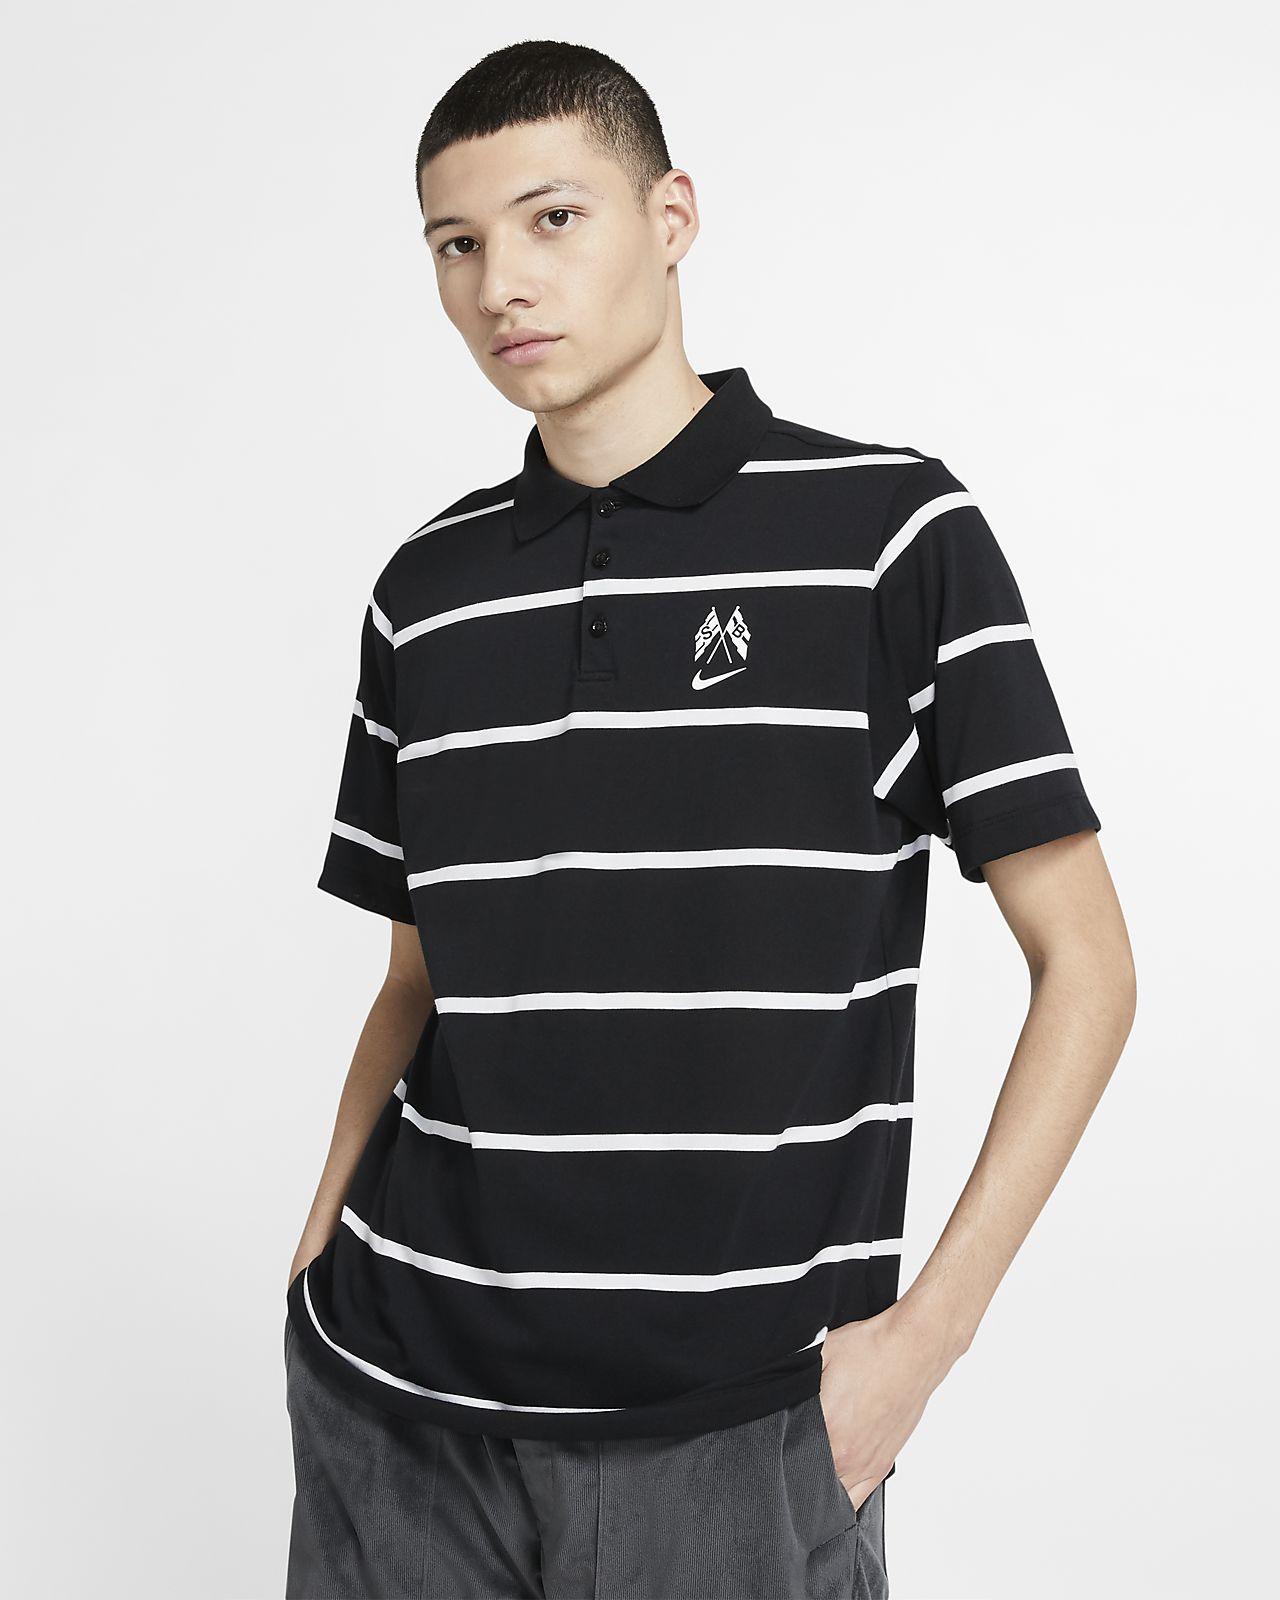 Nike SB Dri-FIT Erkek Kaykay Polo Üst